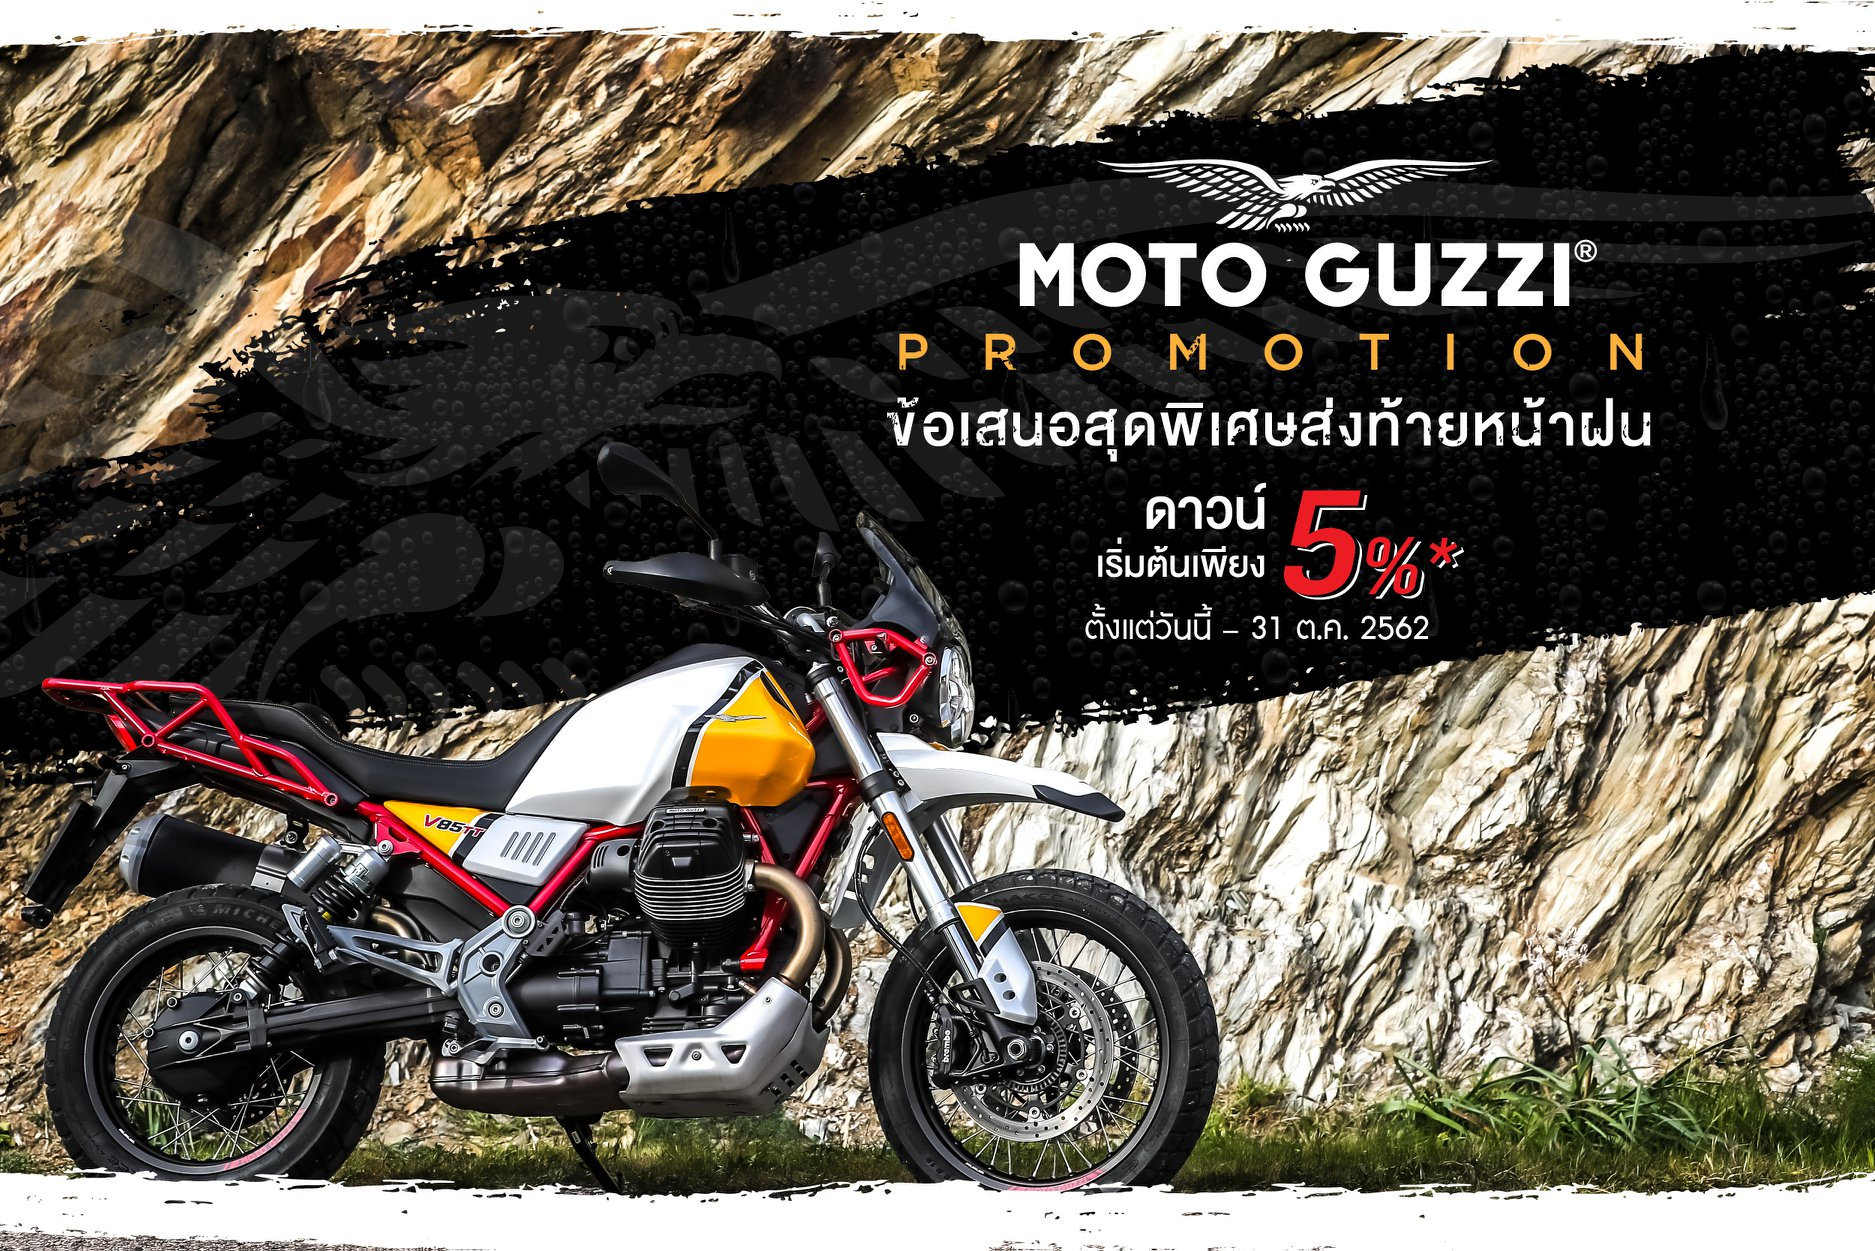 Moto Guzzi Superbike Promotion ประจำเดือนตุลาคม 2562